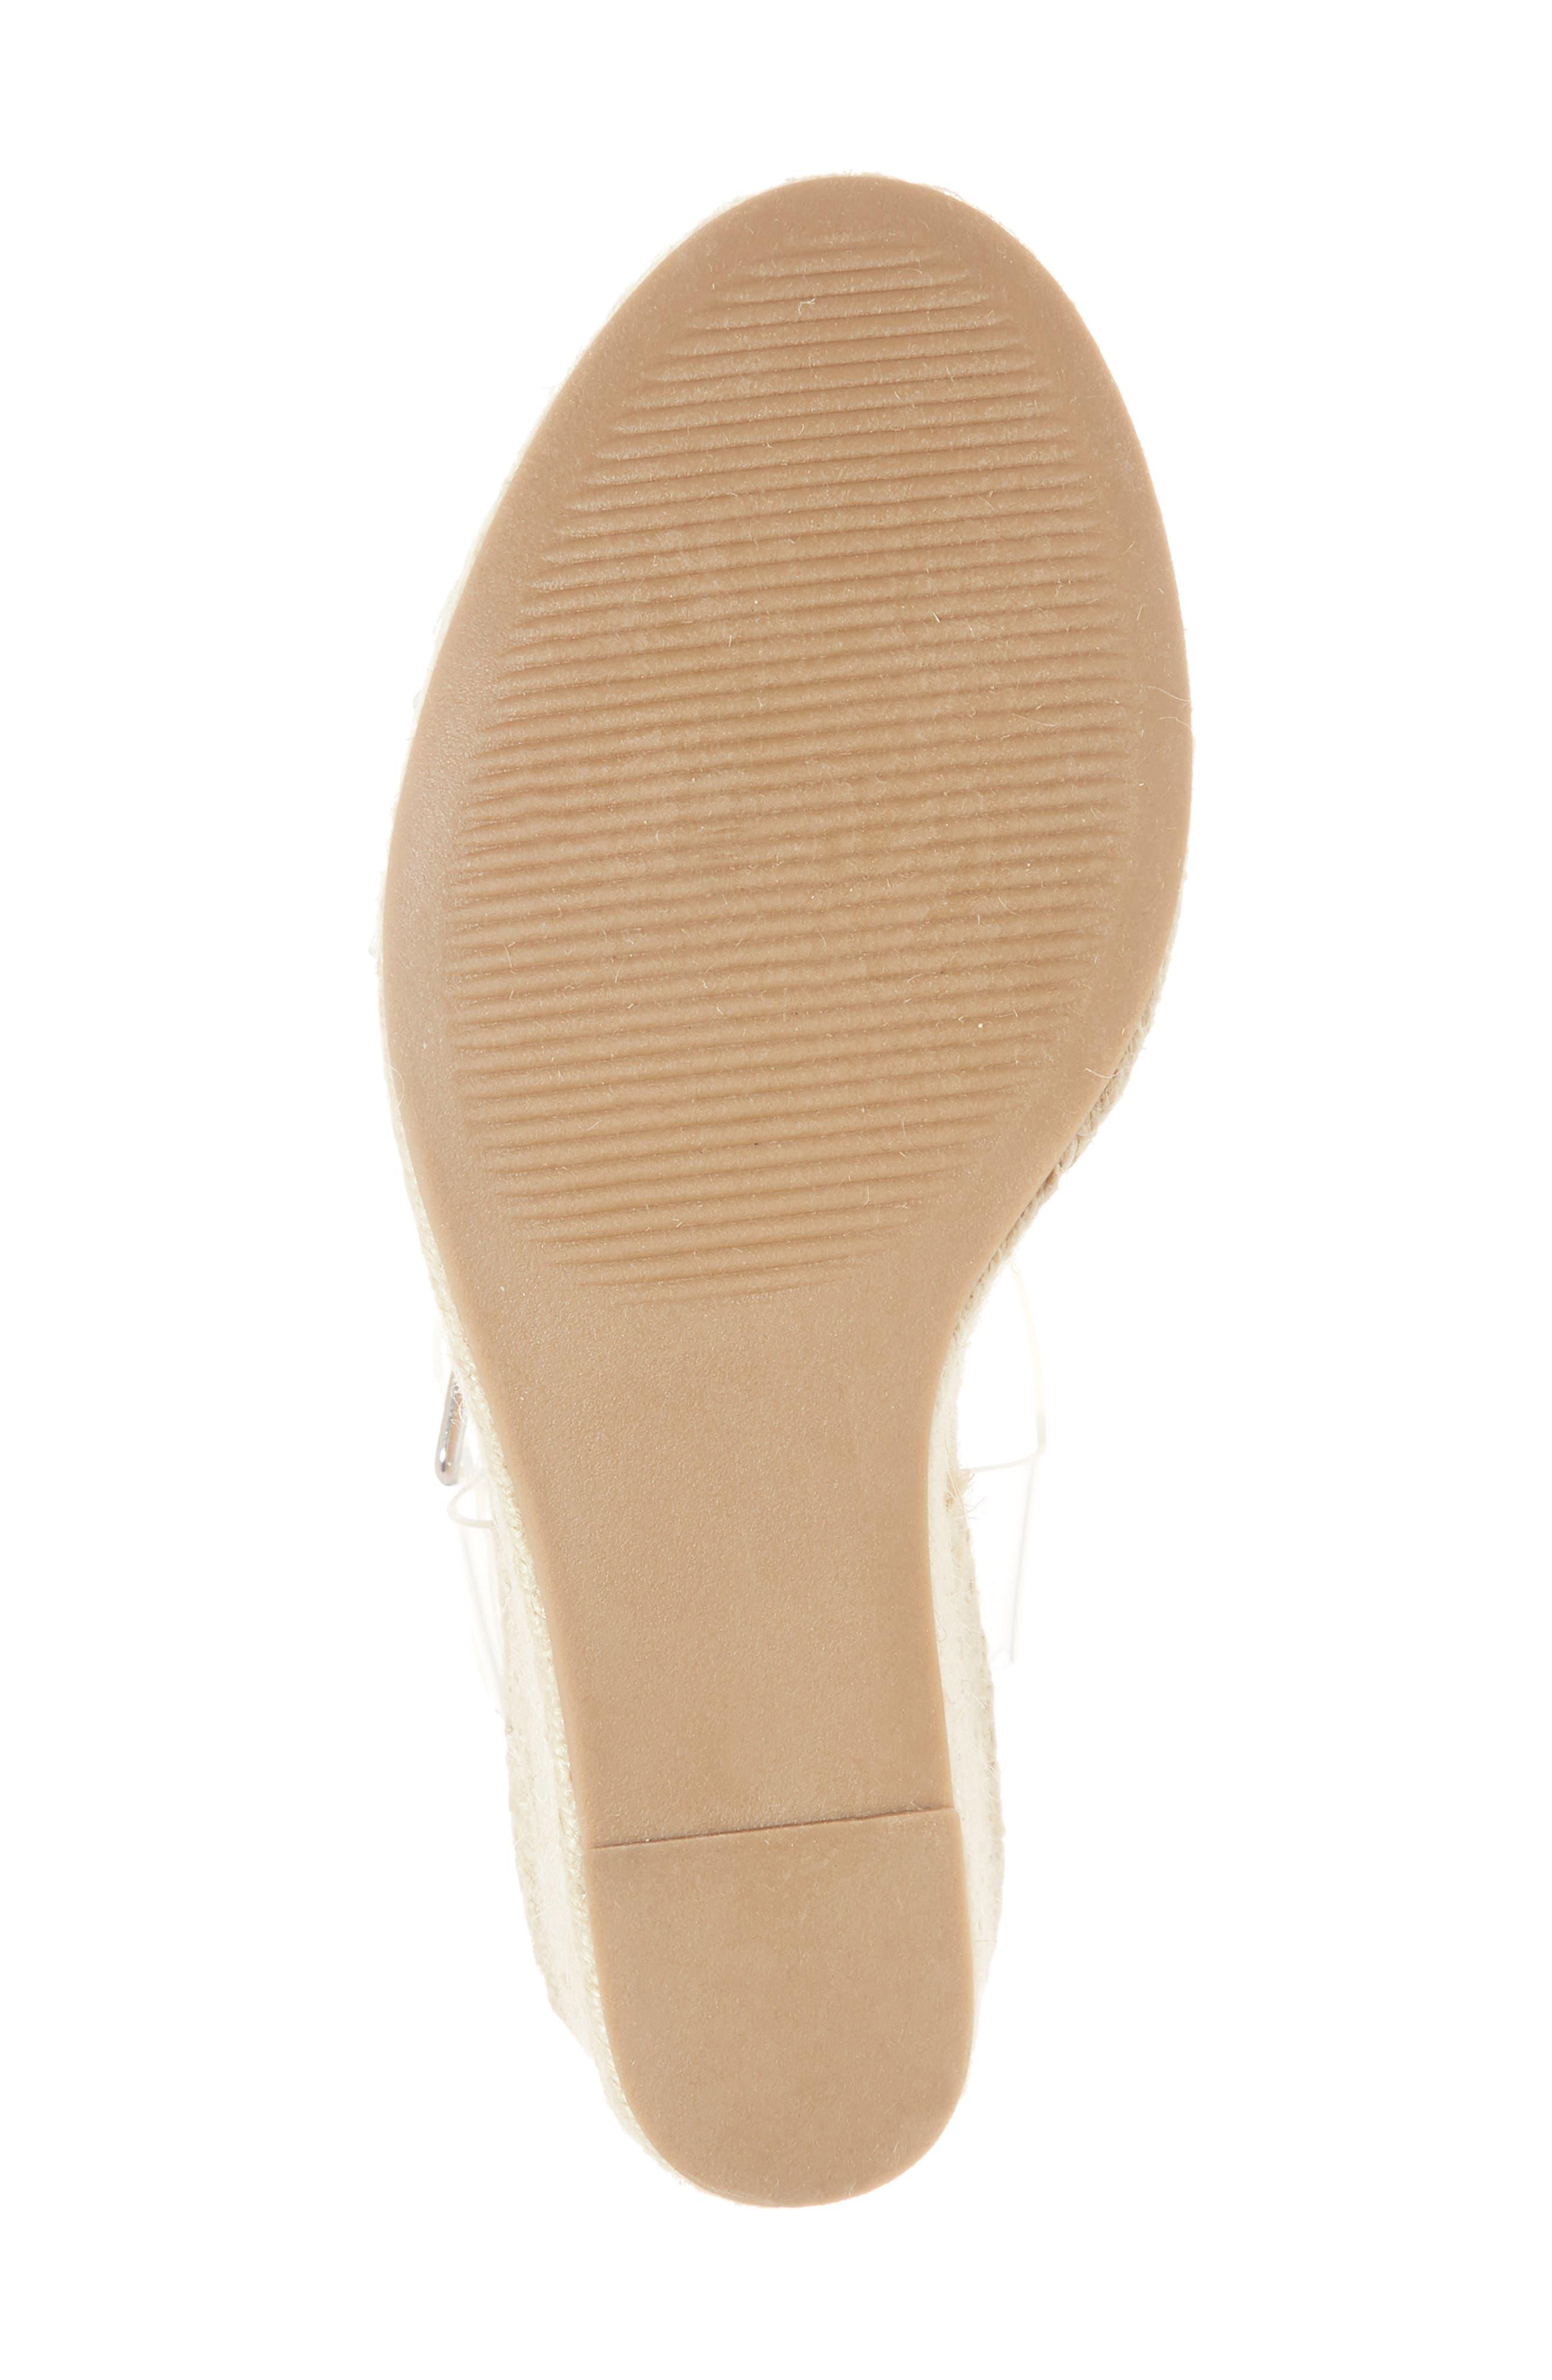 Splash Transparent Strap Wedge Sandal,                             Alternate thumbnail 6, color,                             250